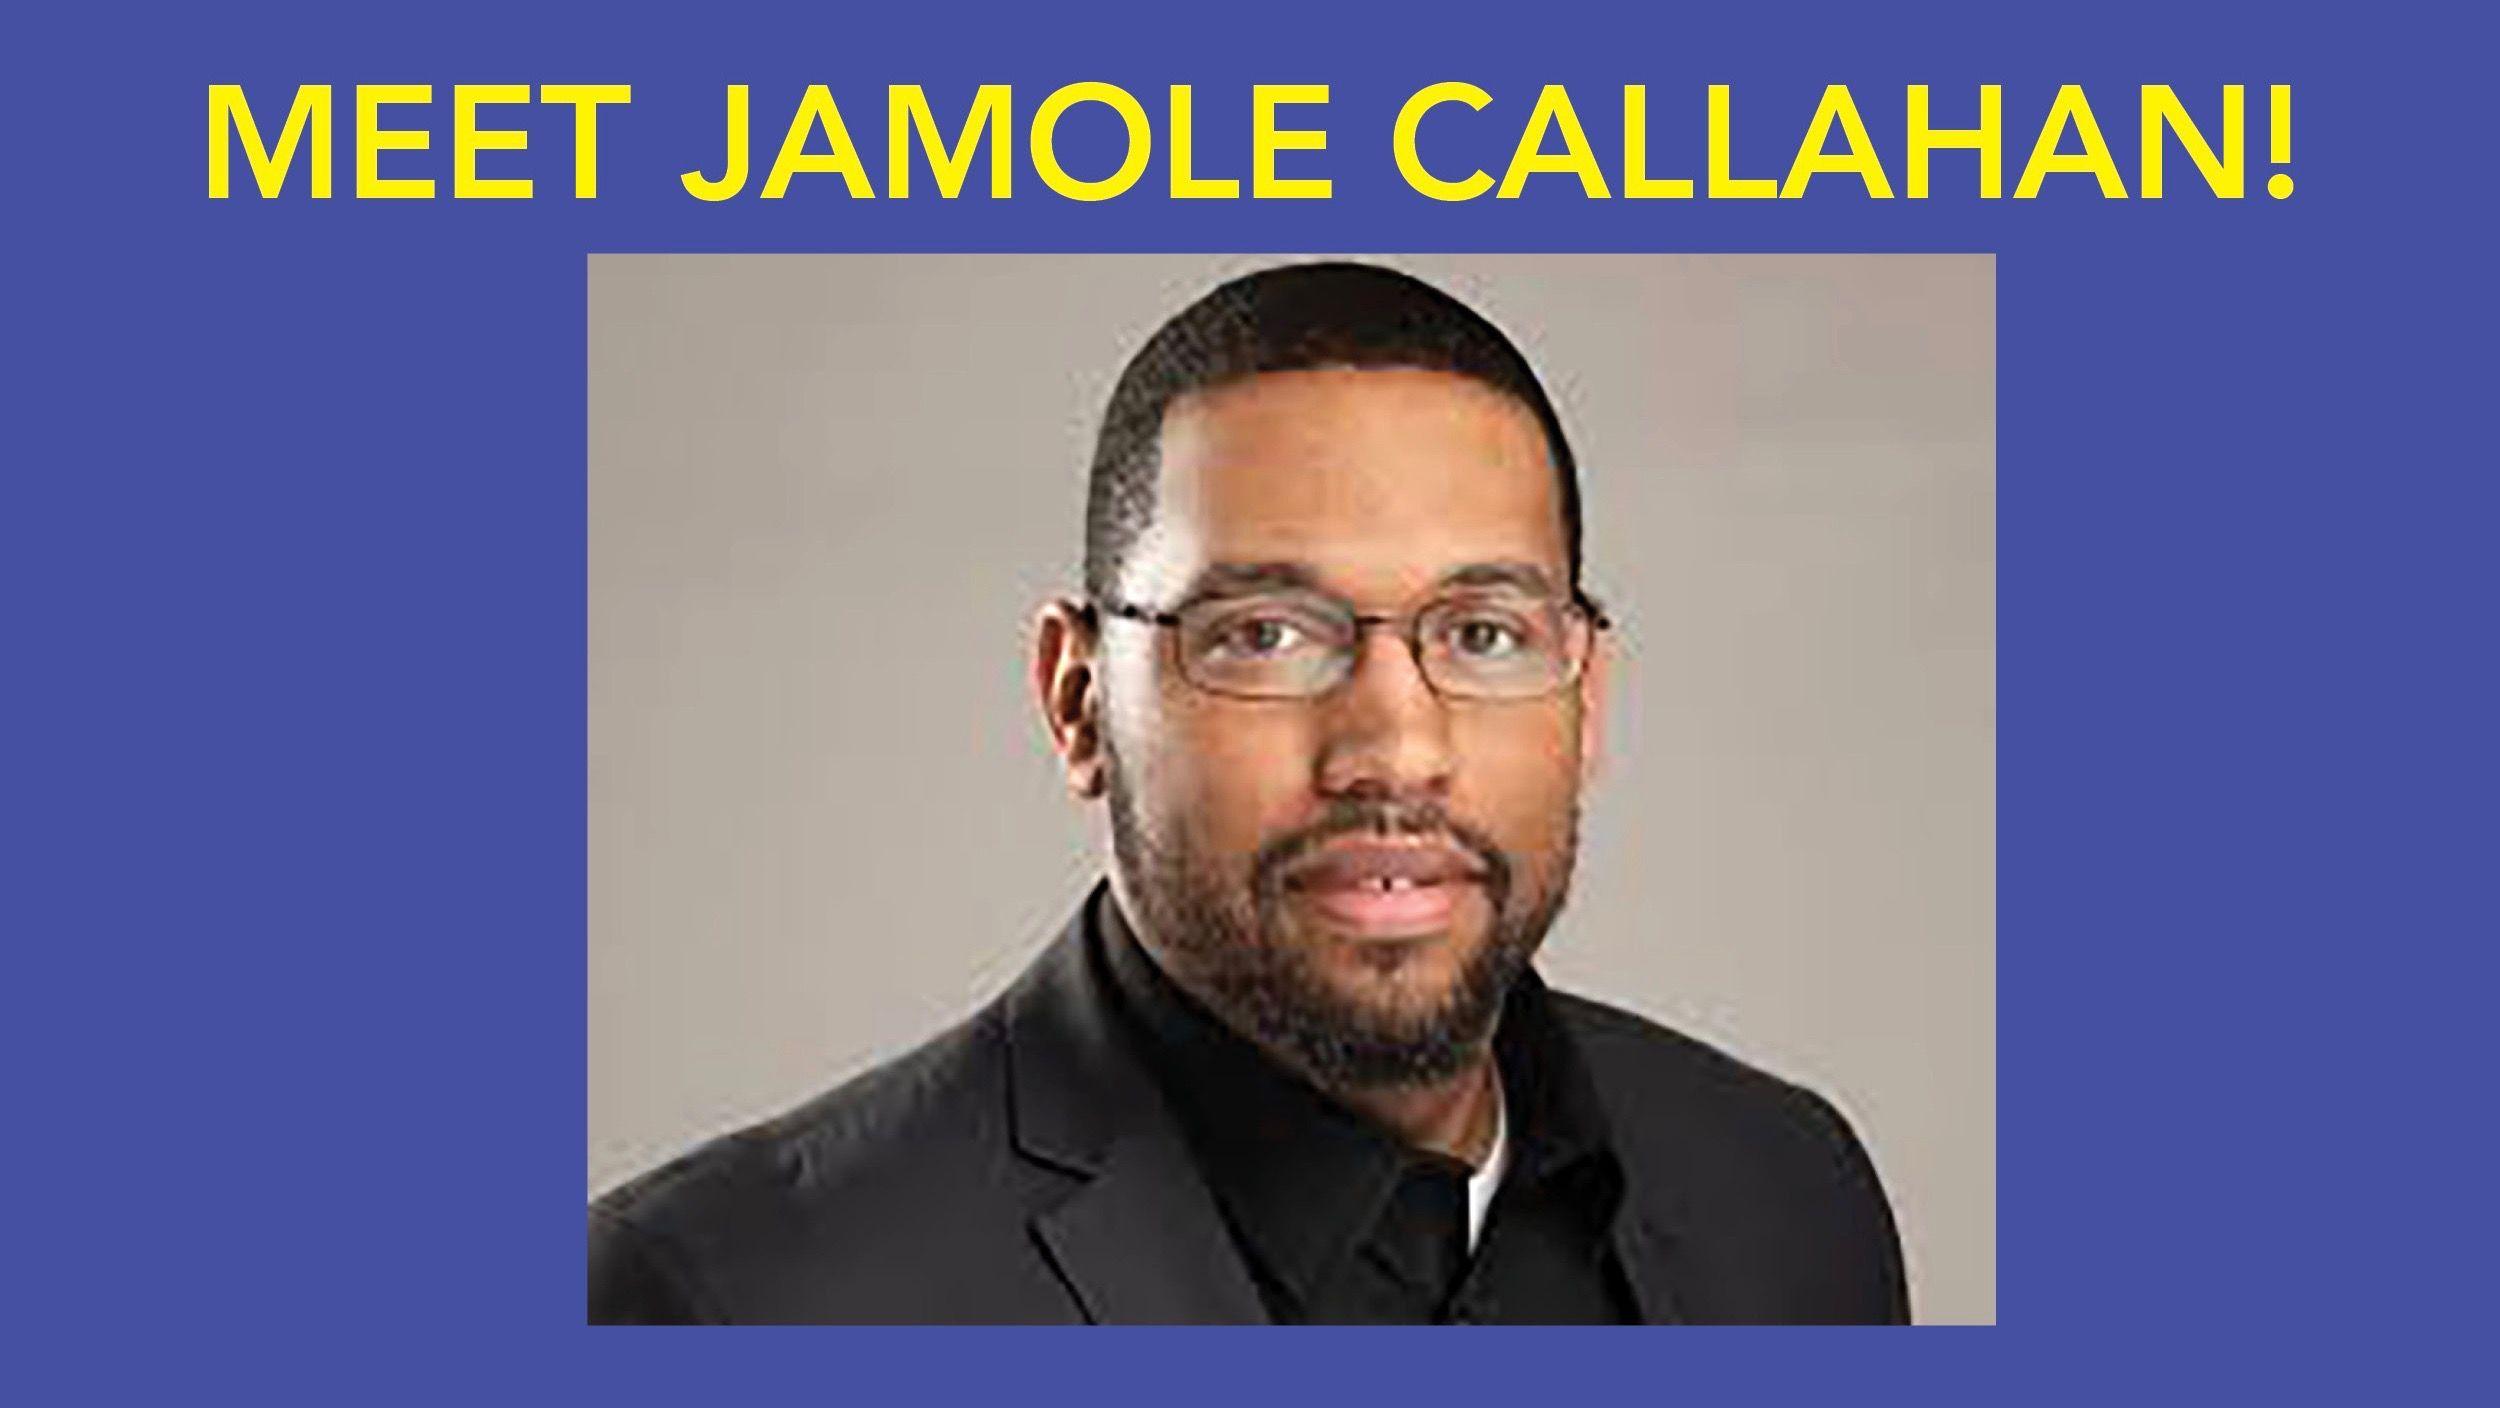 Meet Jamole Callahan